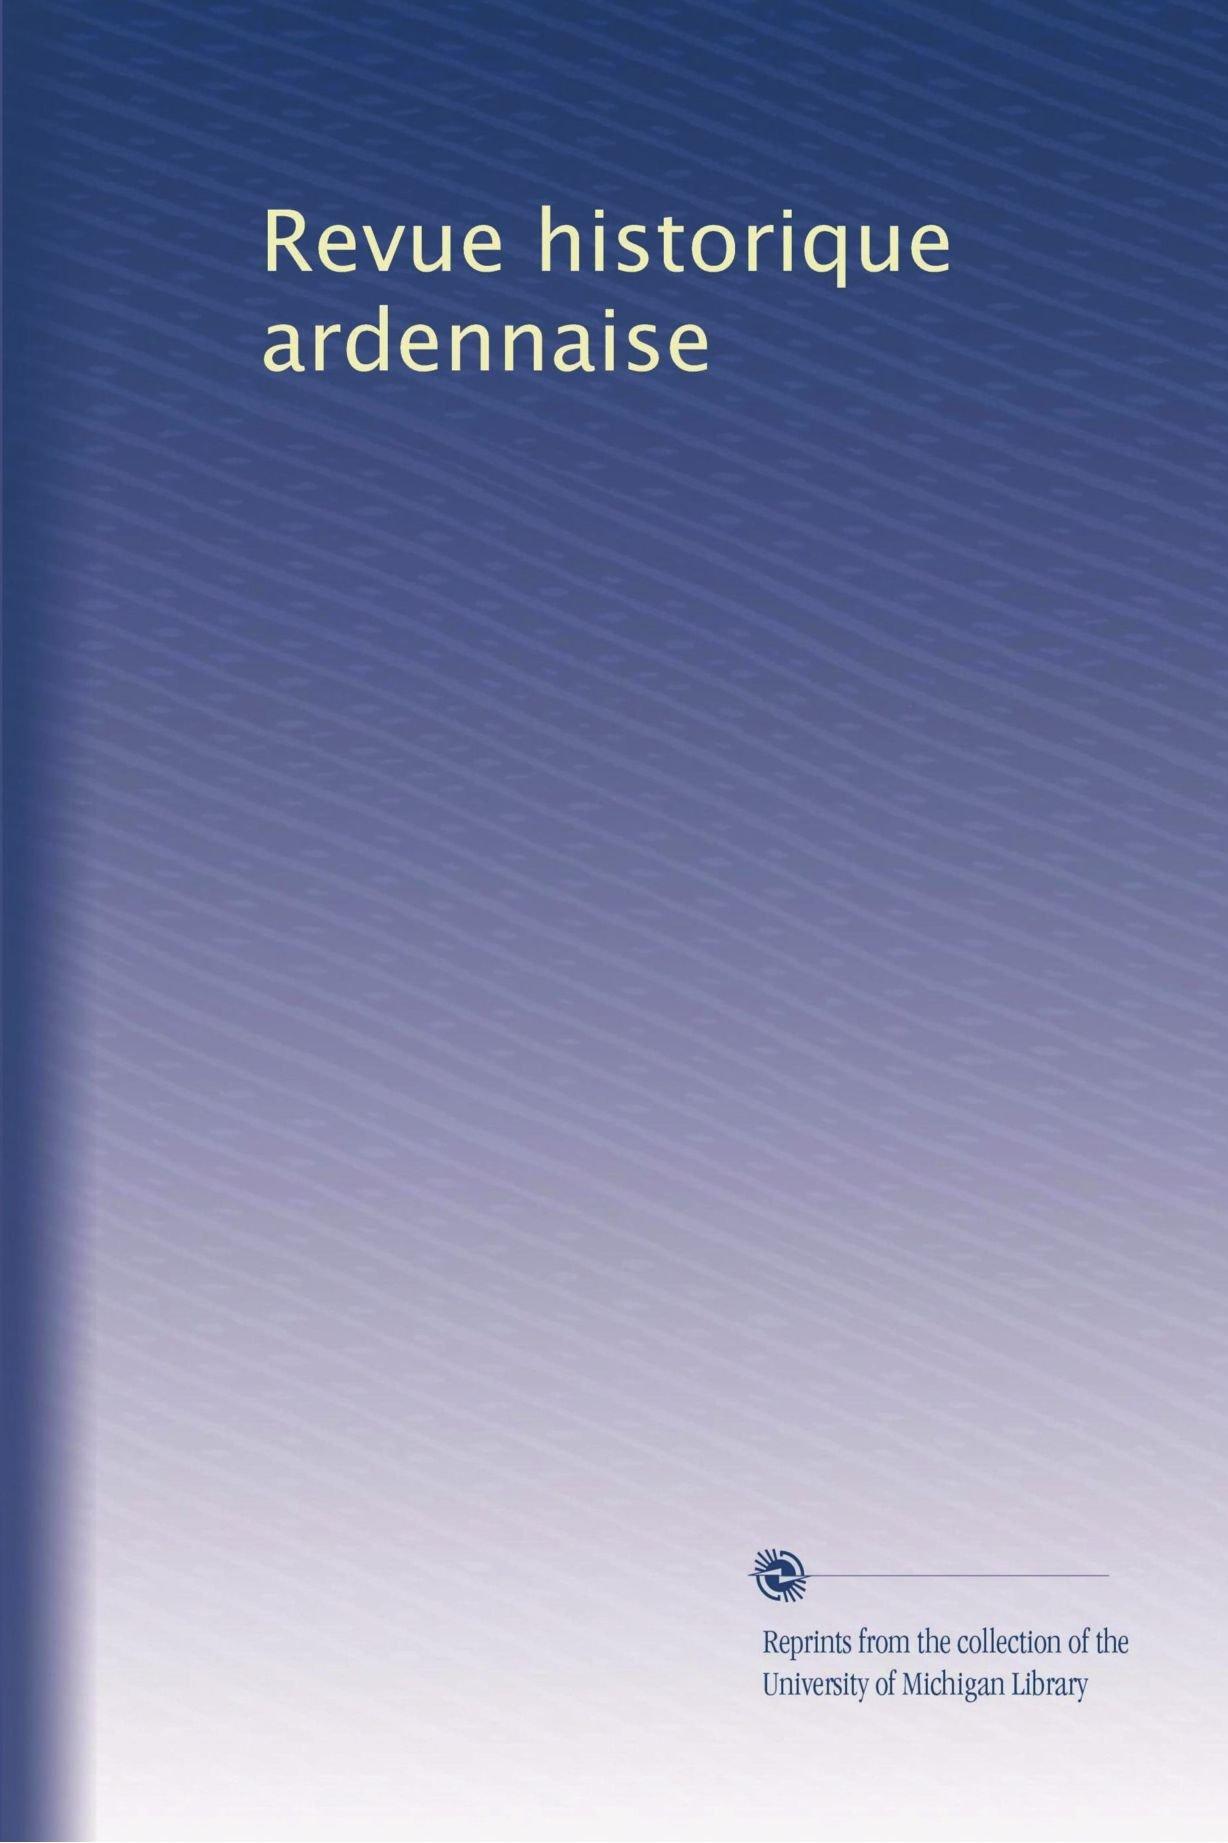 Revue historique ardennaise (Volume 20) (French Edition) pdf